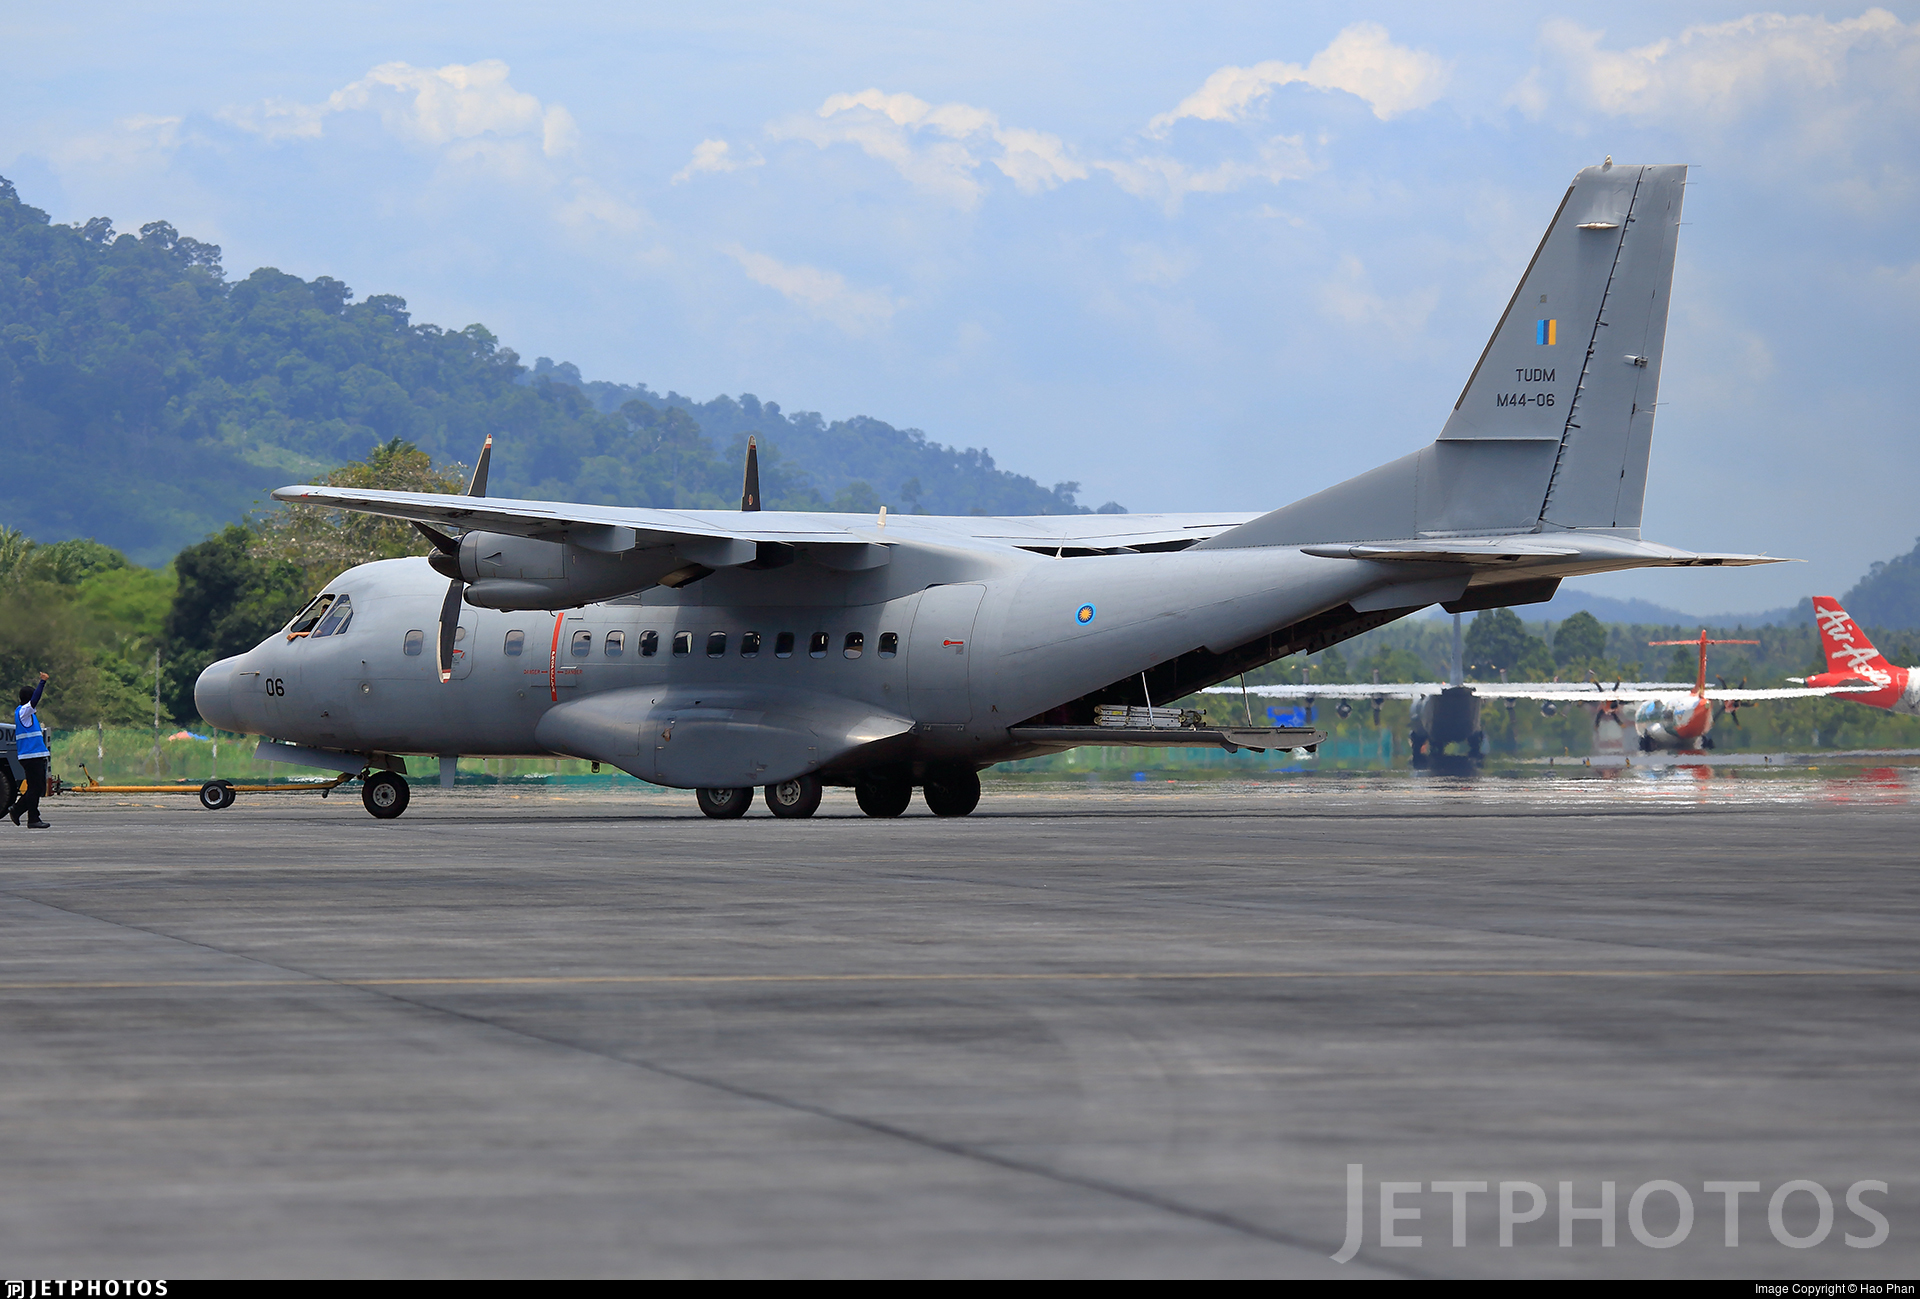 M44-06 - CASA CN-235M-200 - Malaysia - Air Force